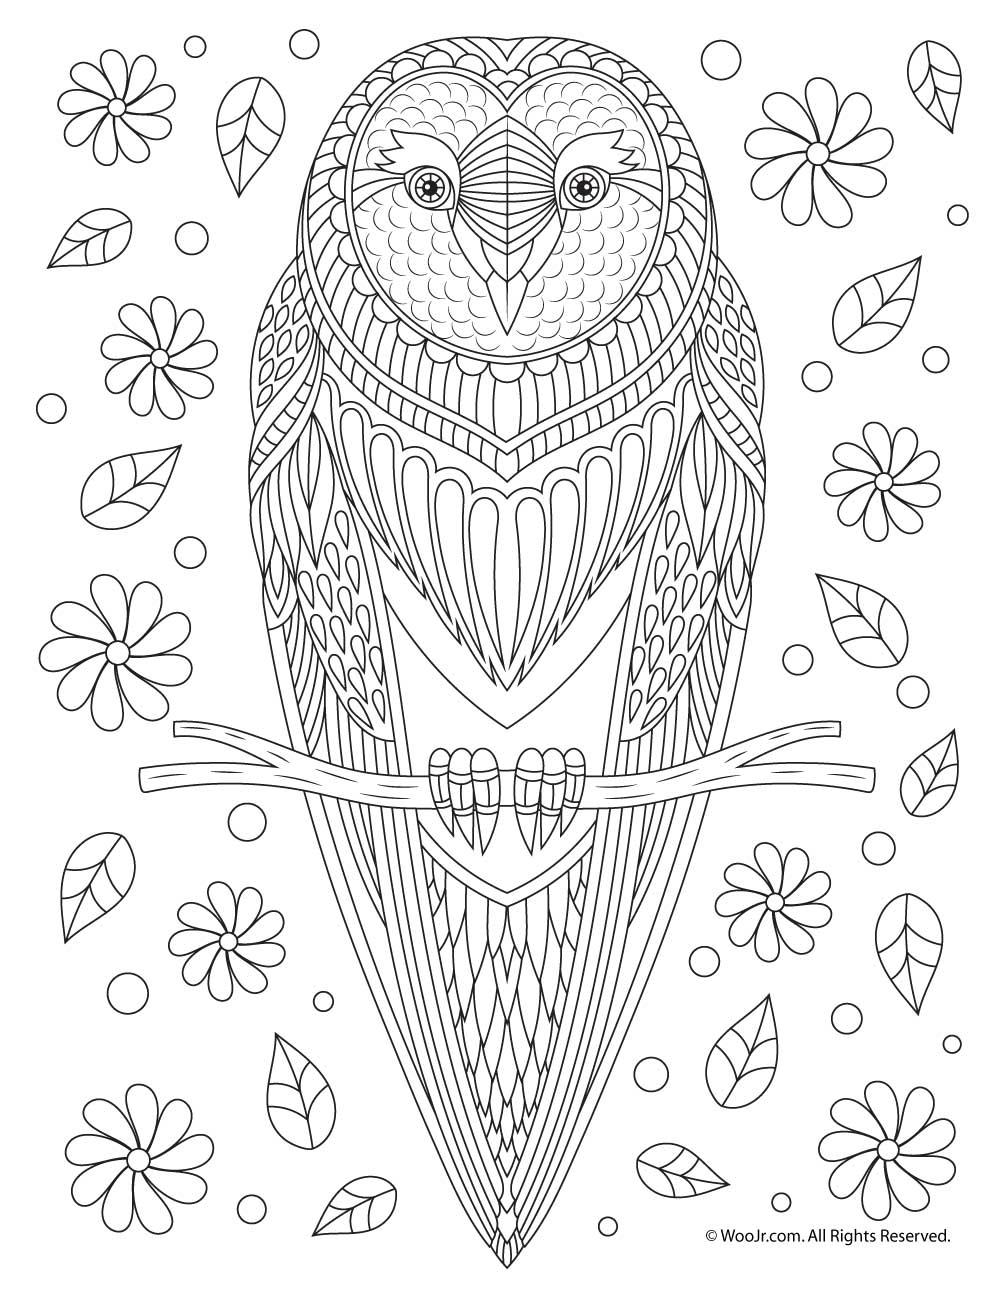 Owl Adult Coloring Page | Woo! Jr. Kids Activities